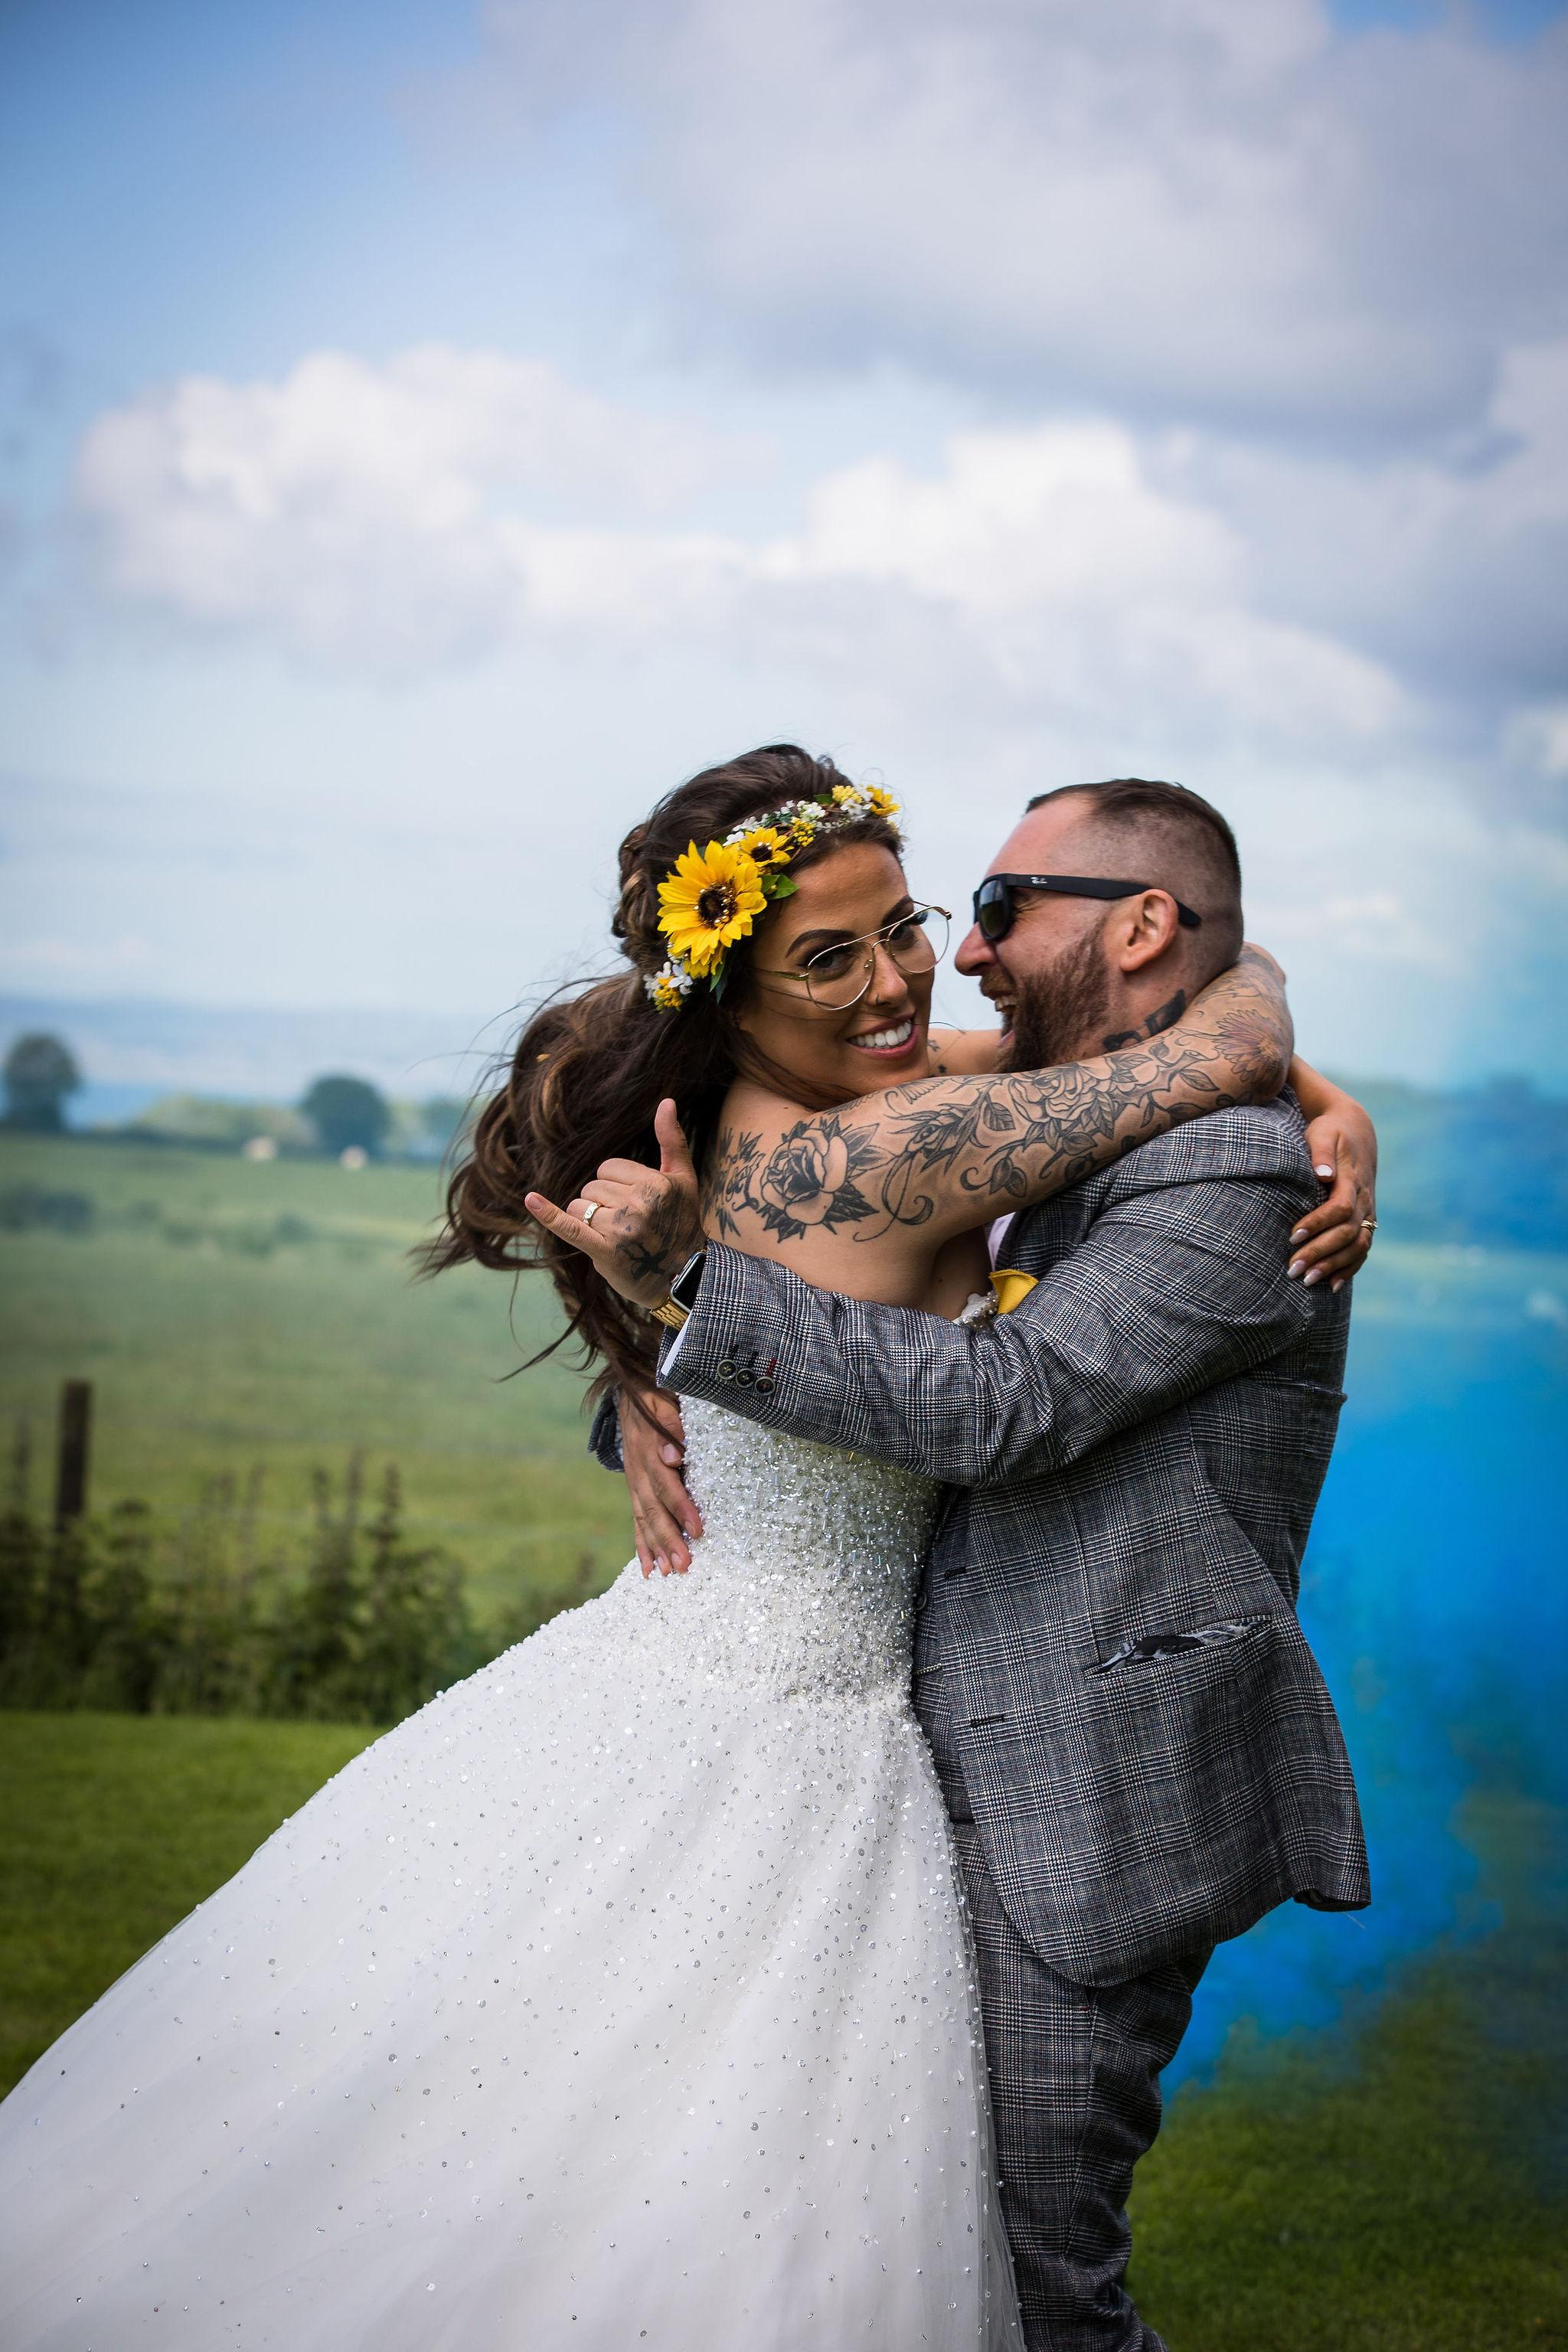 Harriet&Rhys Wedding - Magical sunflower wedding - quirky wedding with dodgems (29)